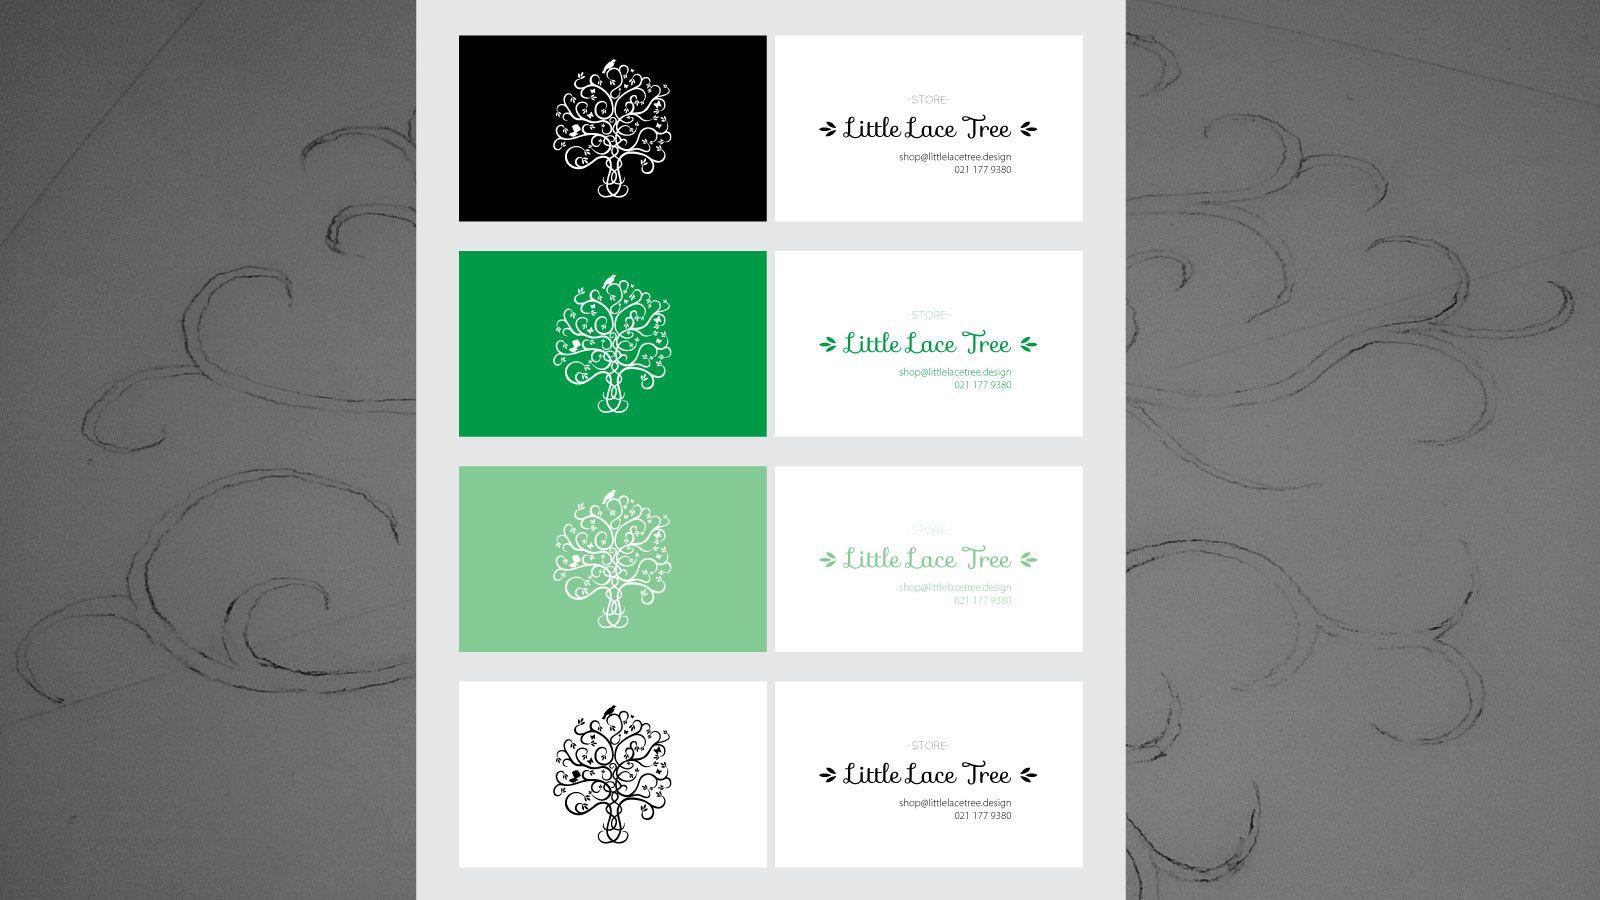 Magnificent Business Cards Dunedin Images - Business Card Ideas ...